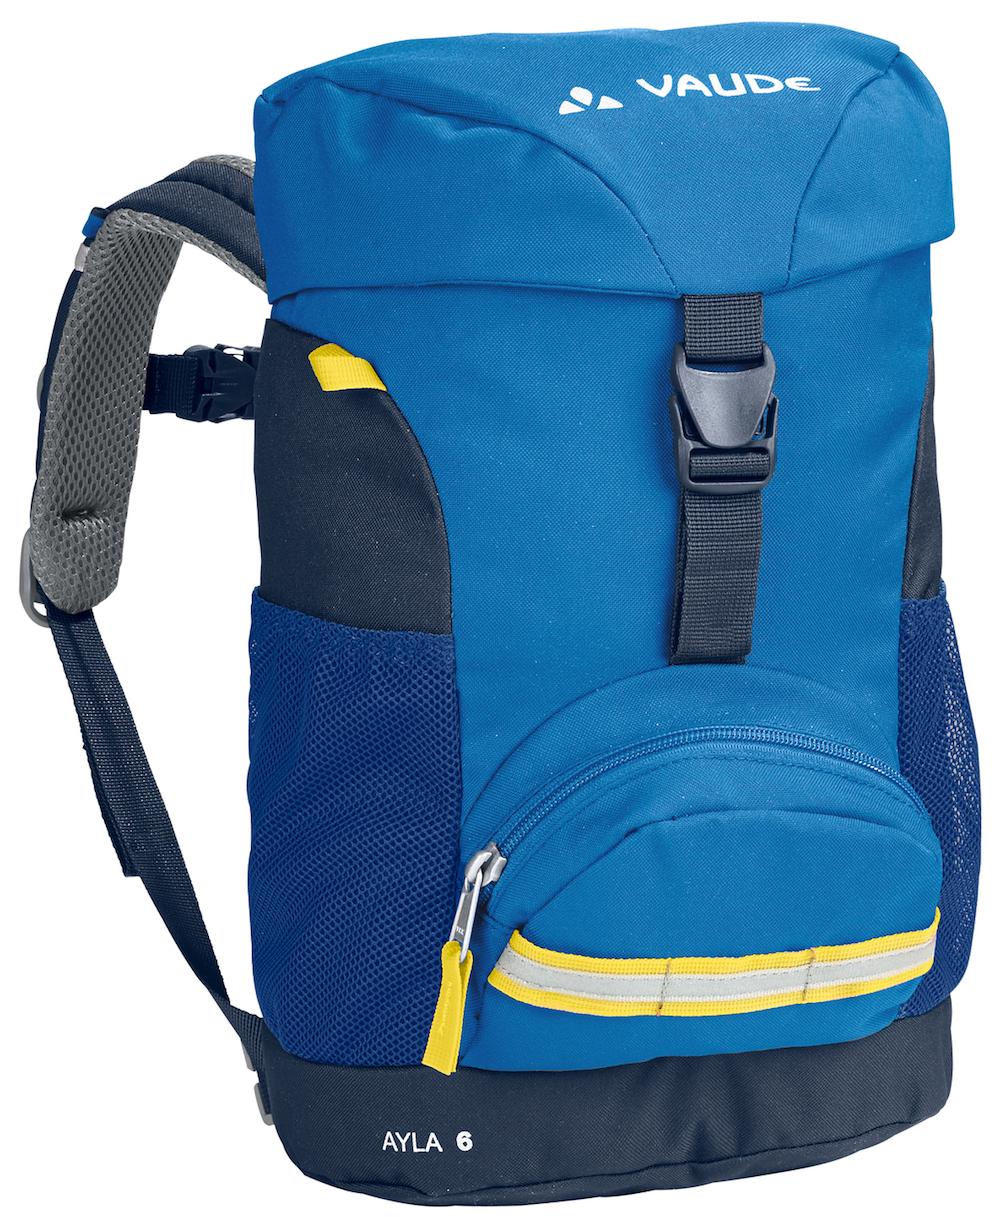 Vaude - Ayla 6 - Backpack - Kids